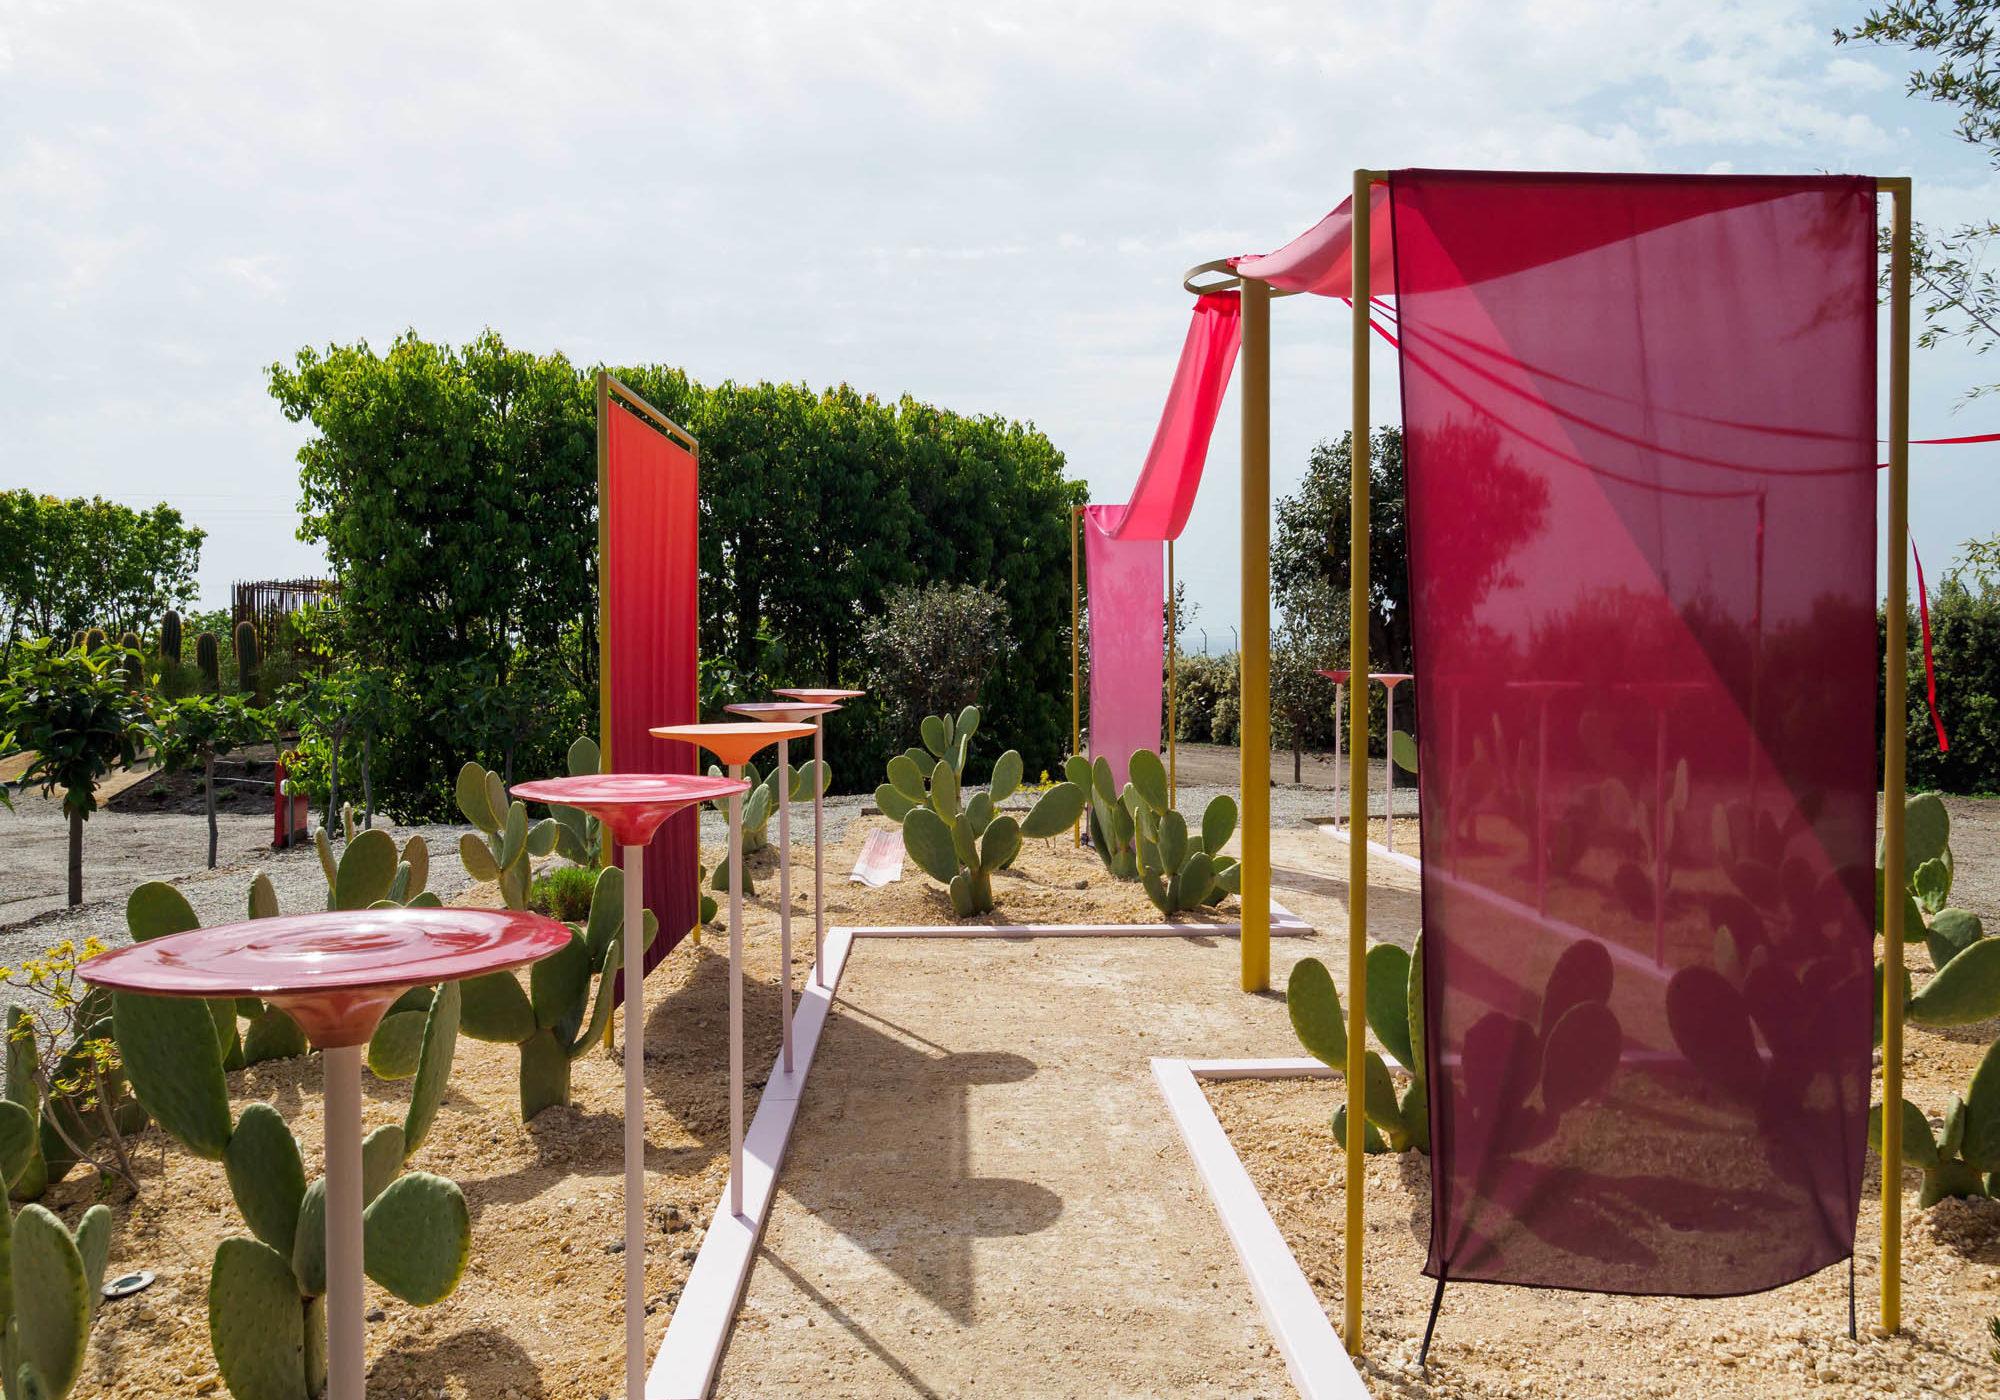 Radicepura Garden Festival 2019. Varie Giardini 27.4.19